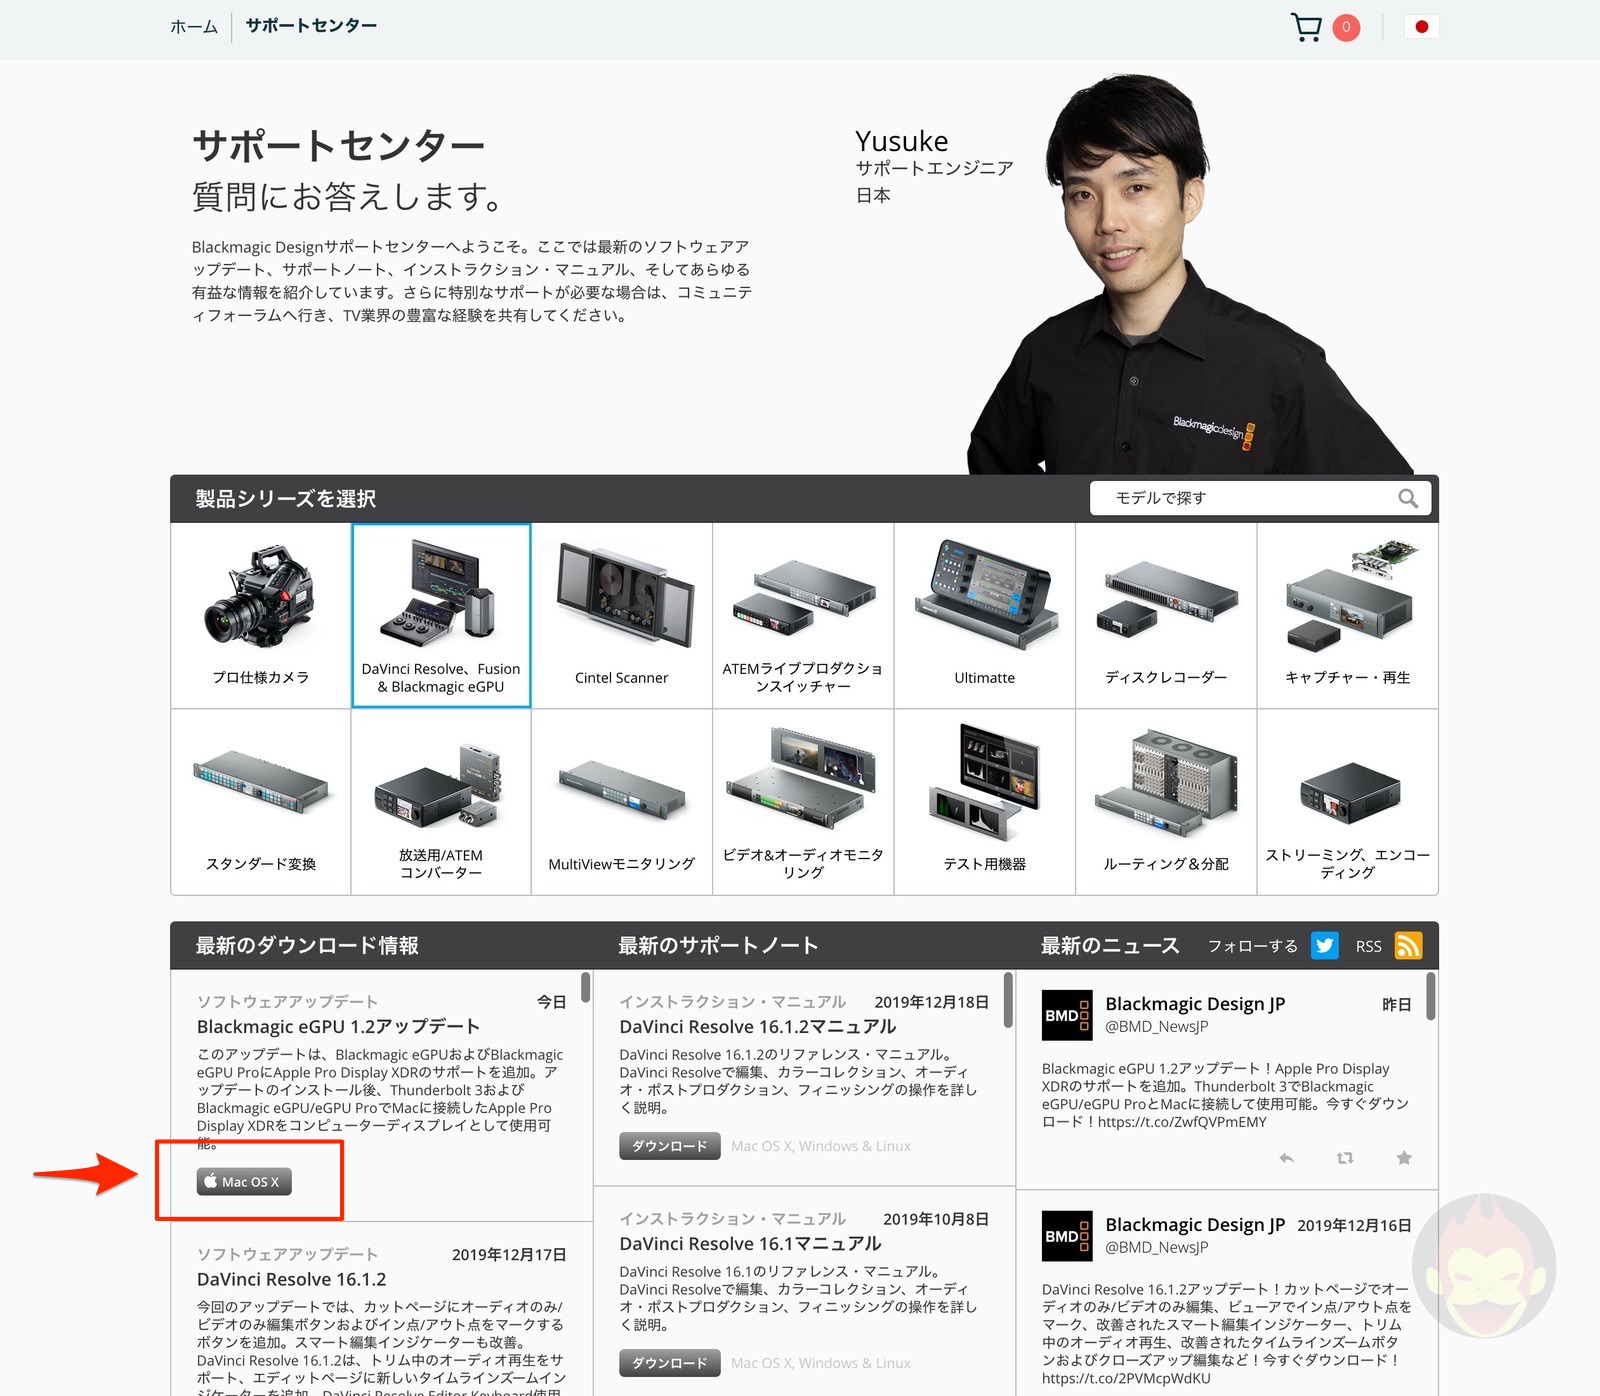 How to update blackmagic egpu firmware 01 2